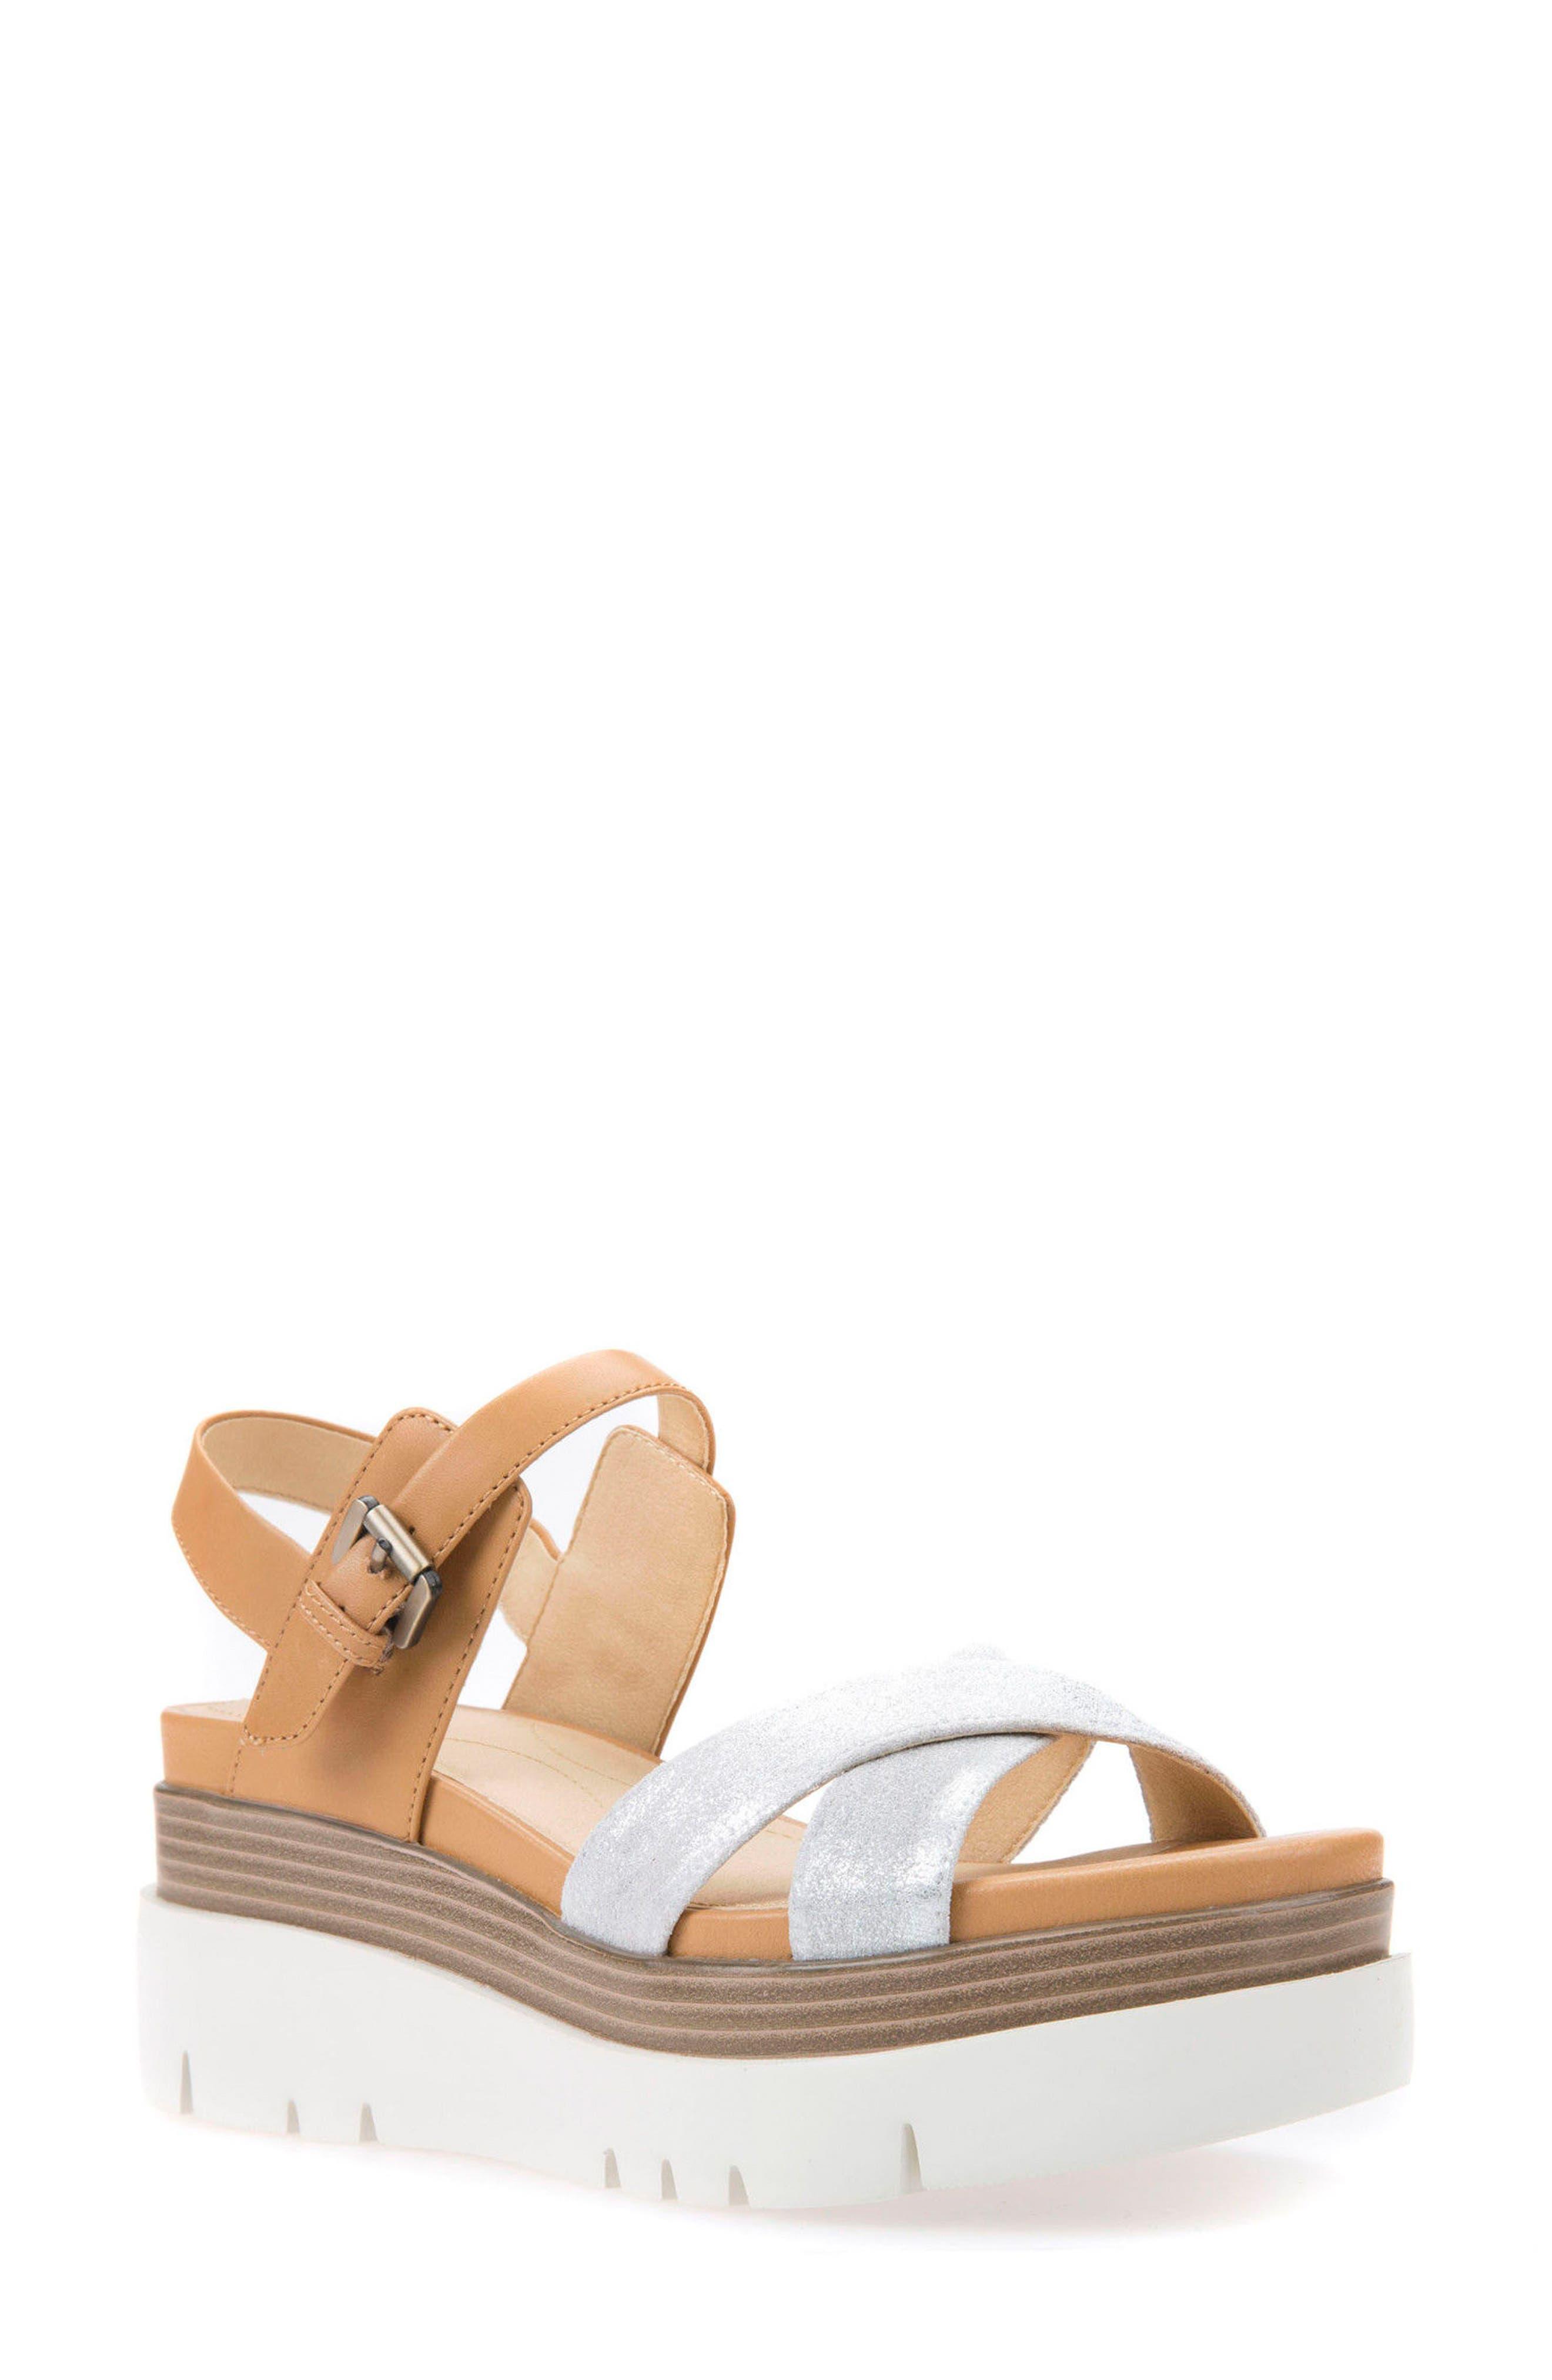 Radwa Platform Sandal,                         Main,                         color, Off White Leather